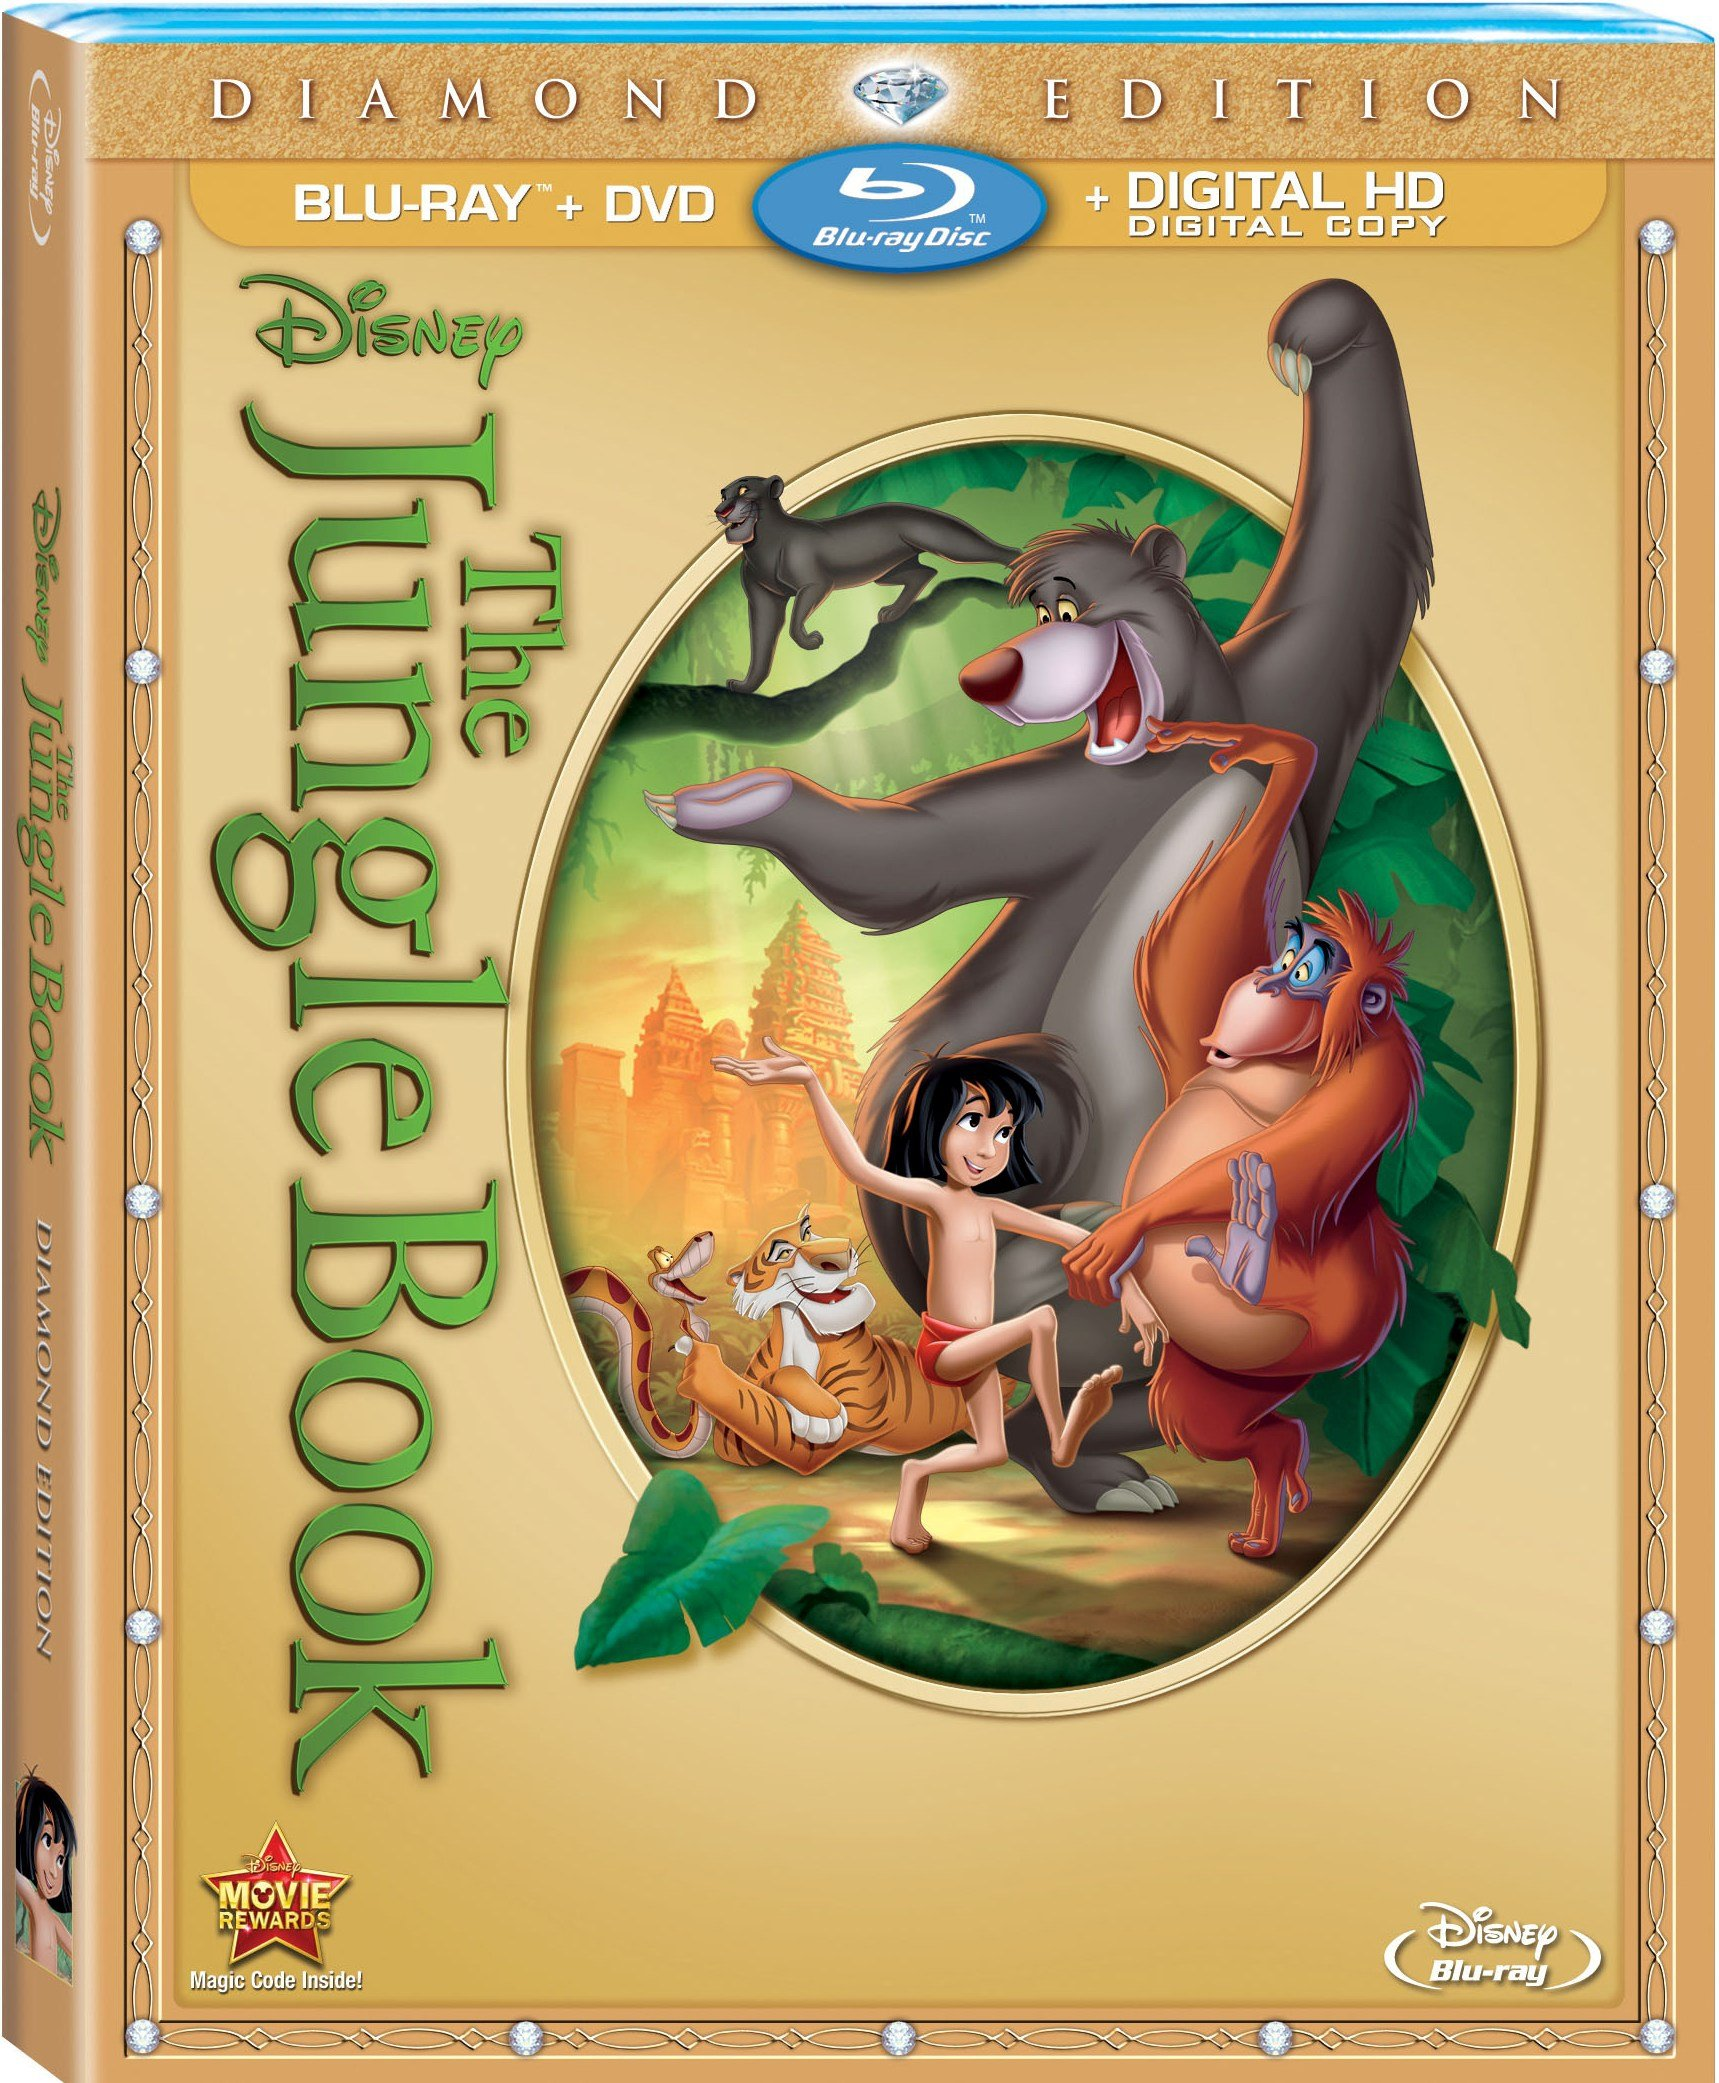 The Jungle Book' Diamond Edition Blu-Ray Review